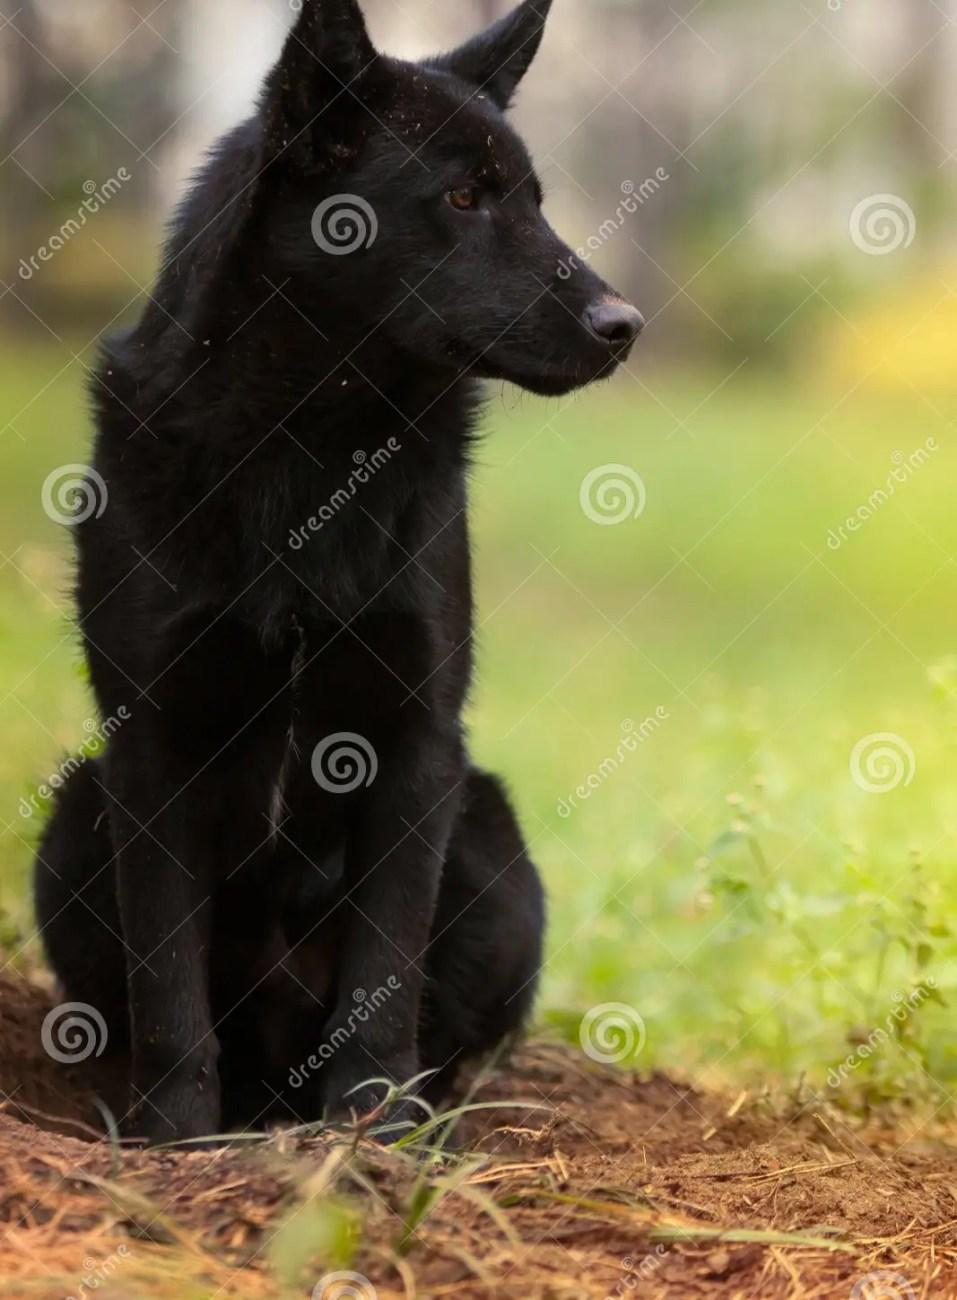 black sad dog. stock photo - image: 61672250